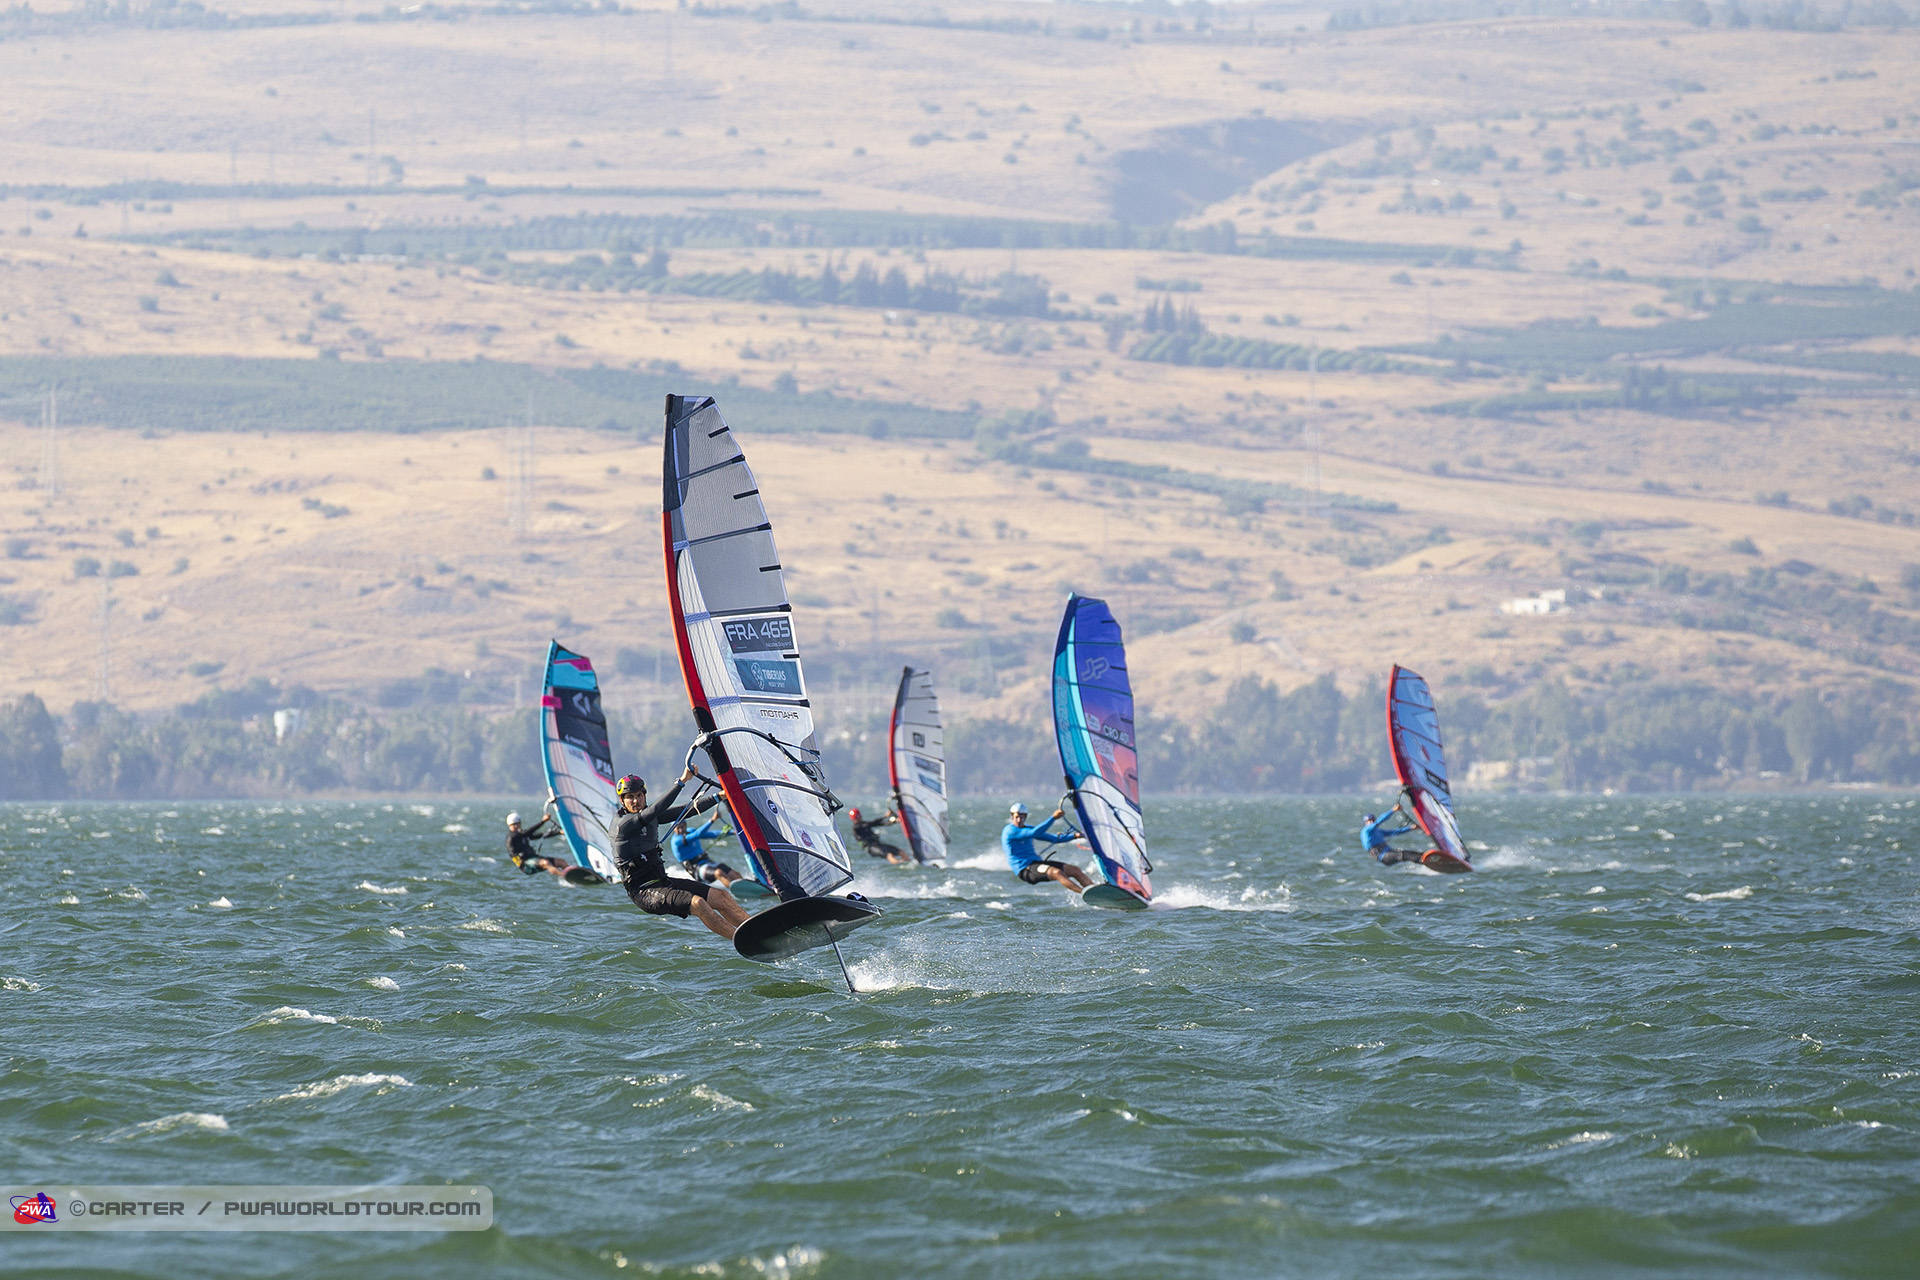 Nicolas Goyard(F-465)on Top/ ⒸJohn Carter_pwaworldcup.com